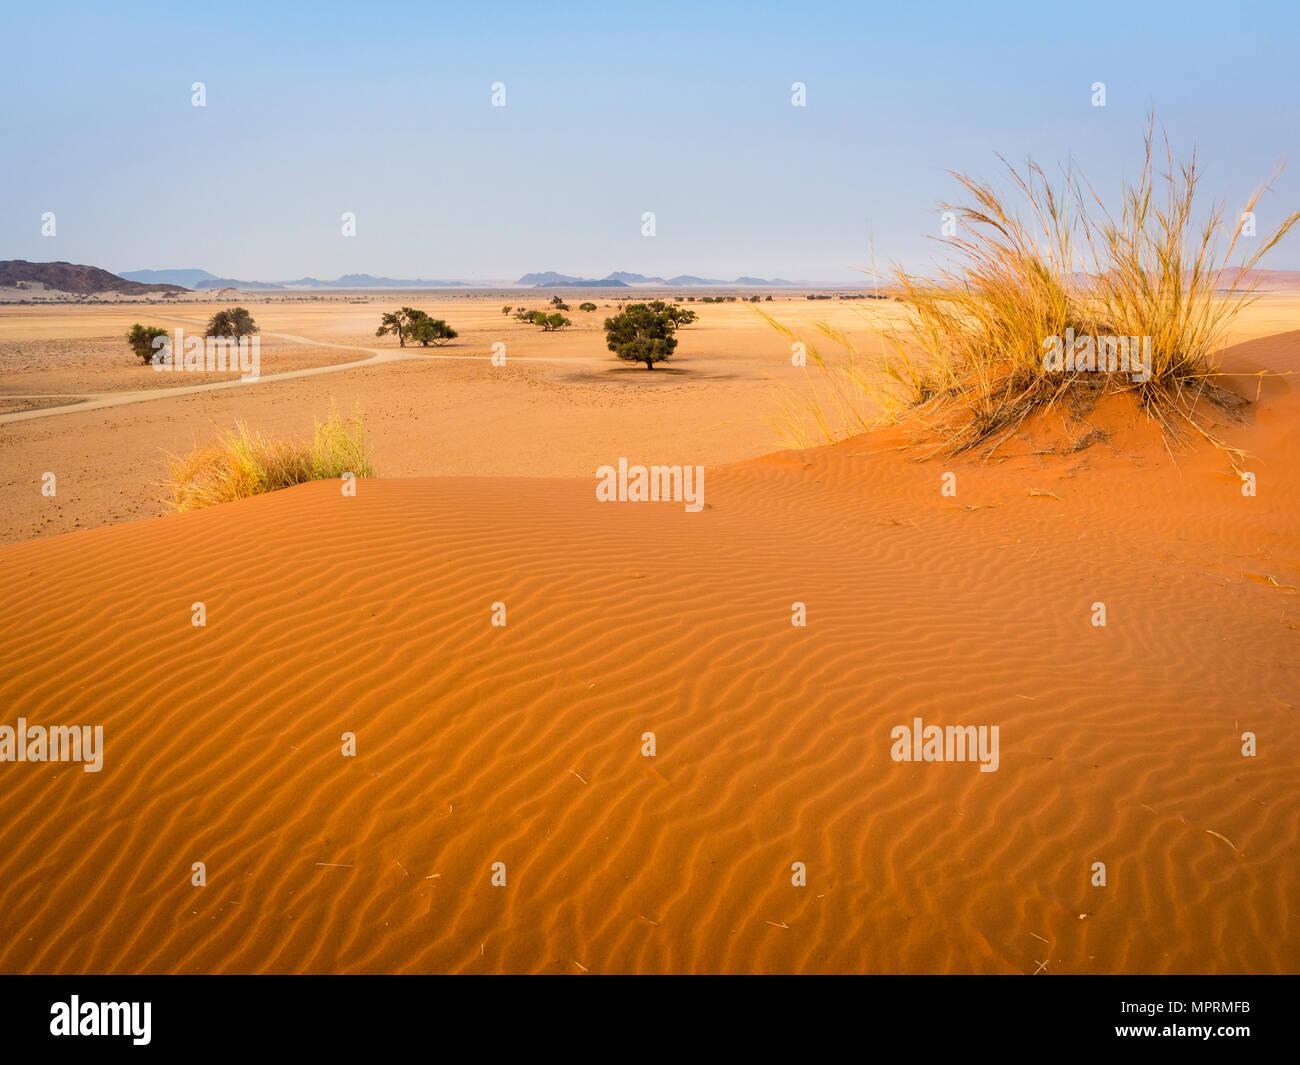 Africa, Namibia, Namib desert, Naukluft National Park, Sossusvlei, Elim dune - Stock Image